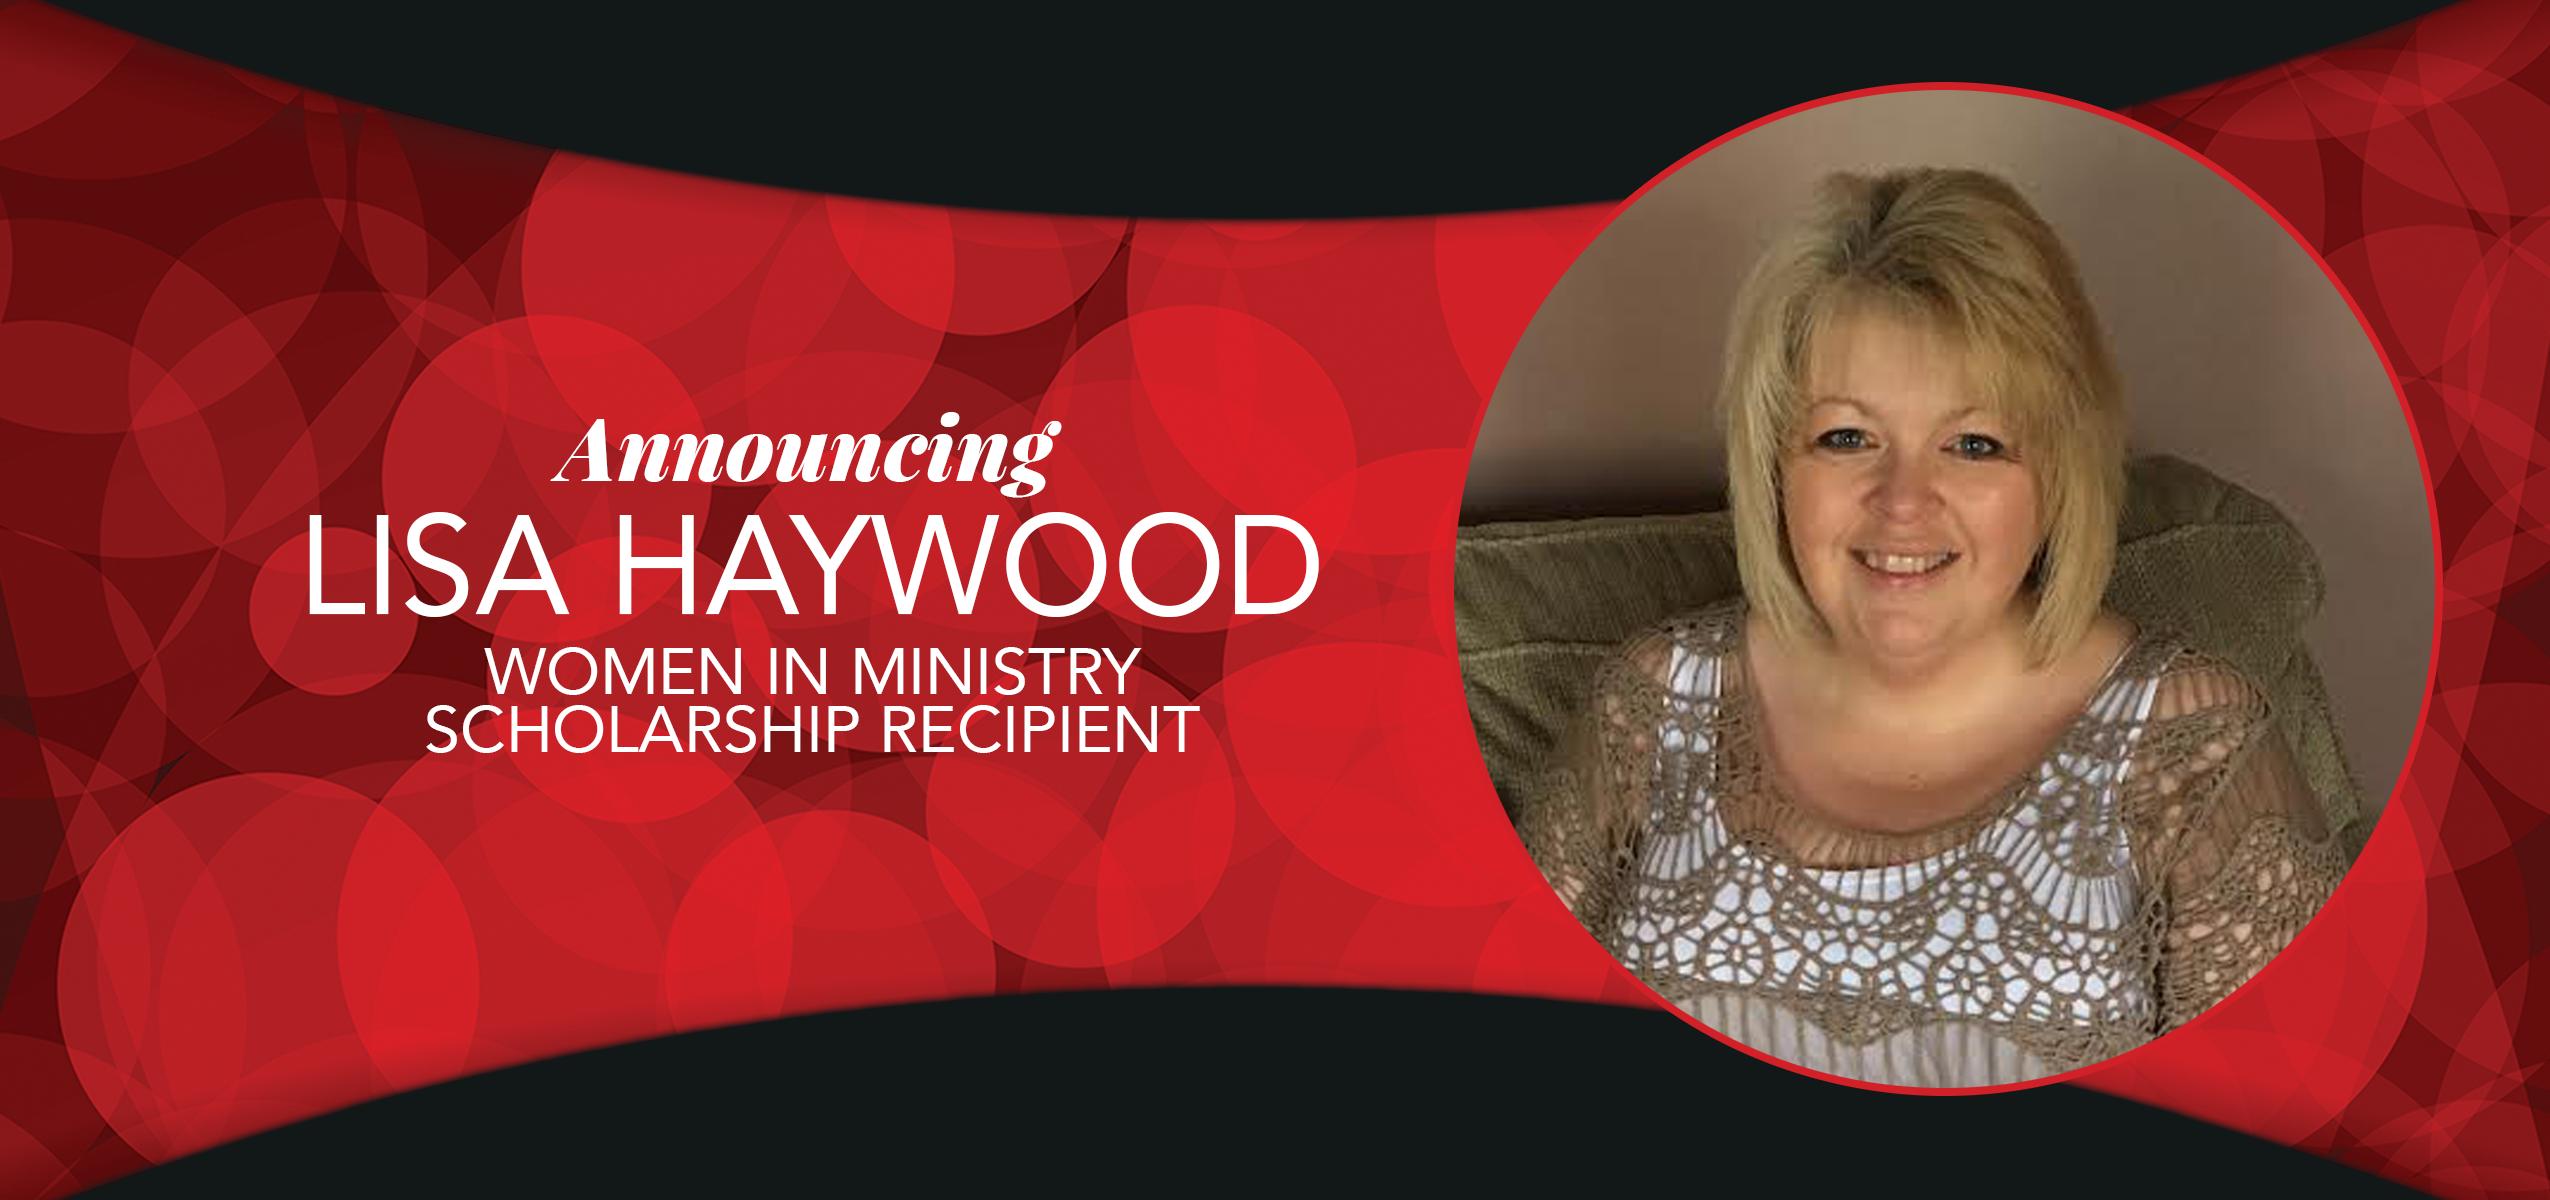 Haywood Recipient of 2017/18 Women in Ministry Scholarship